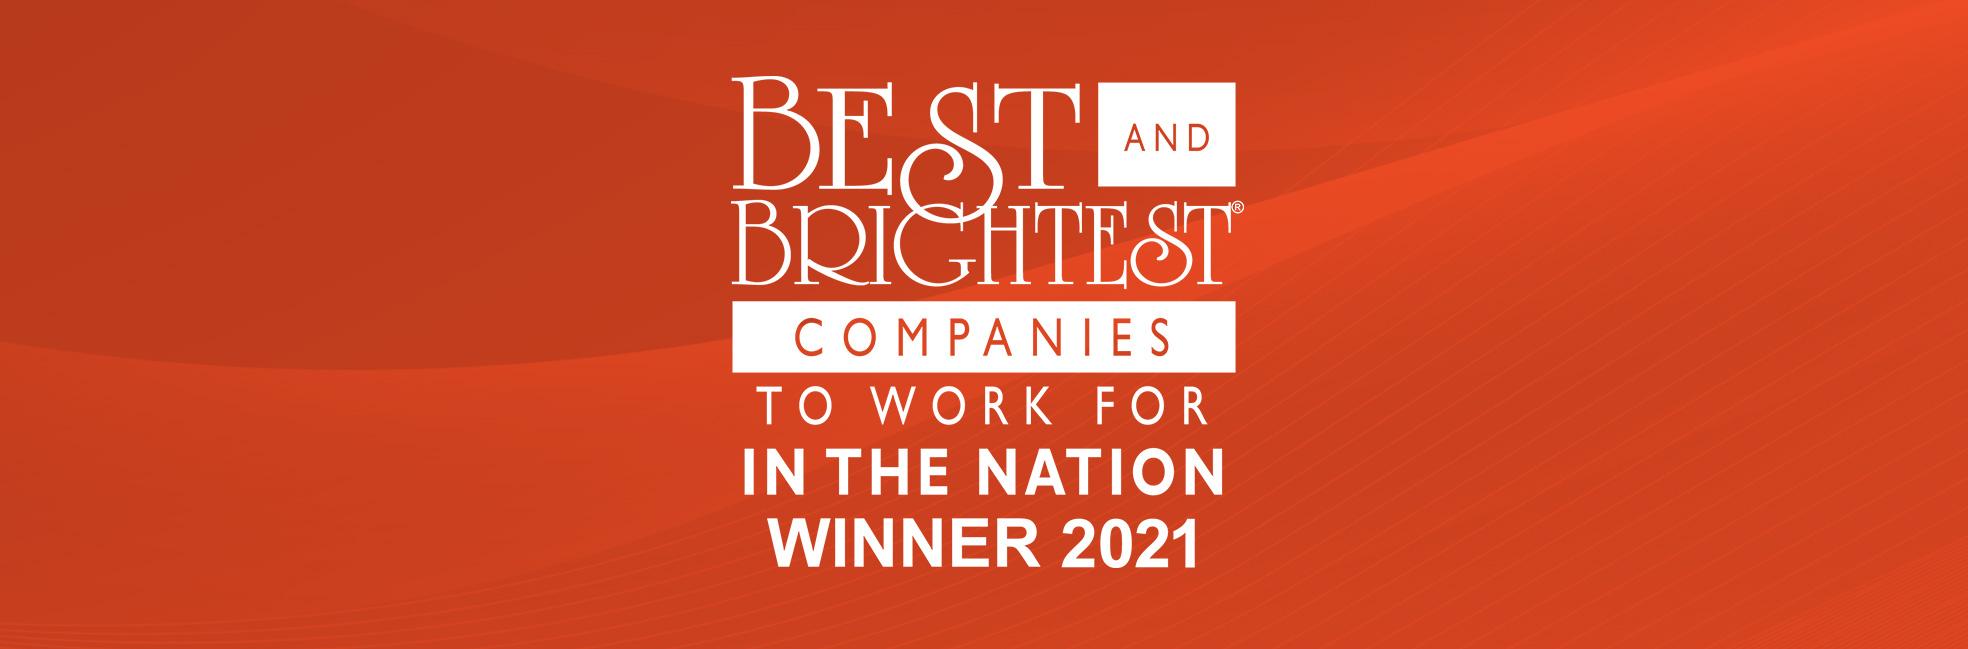 Best and Brightest 2021 Winner Logo